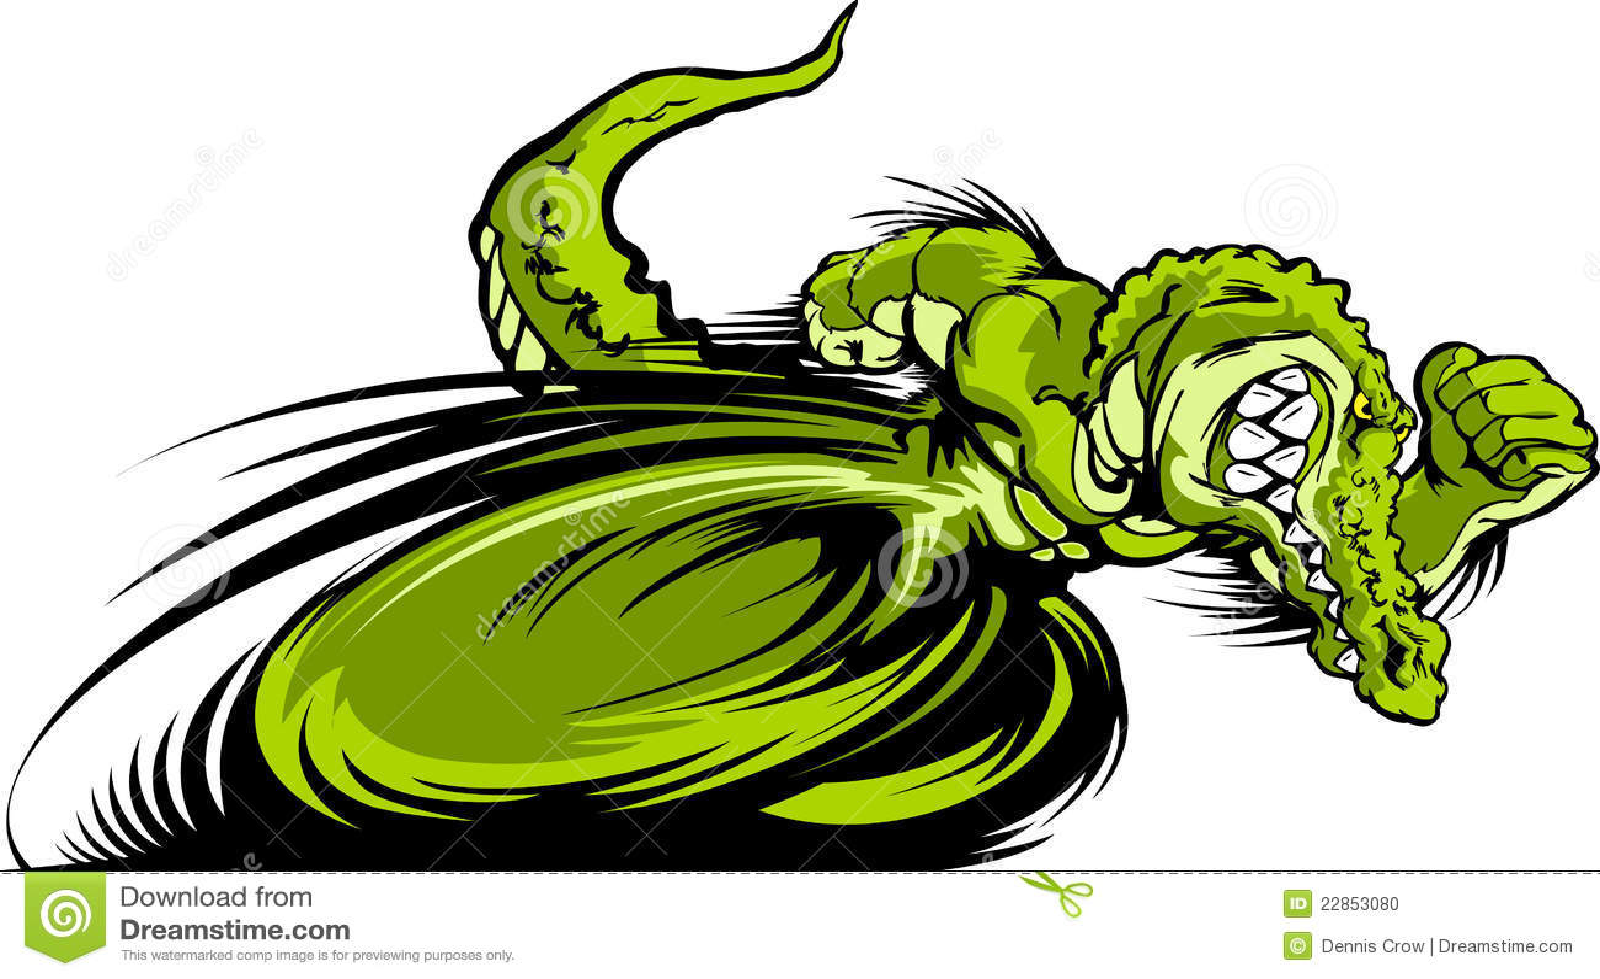 Crocodile Logo Racing gator or croc mascot